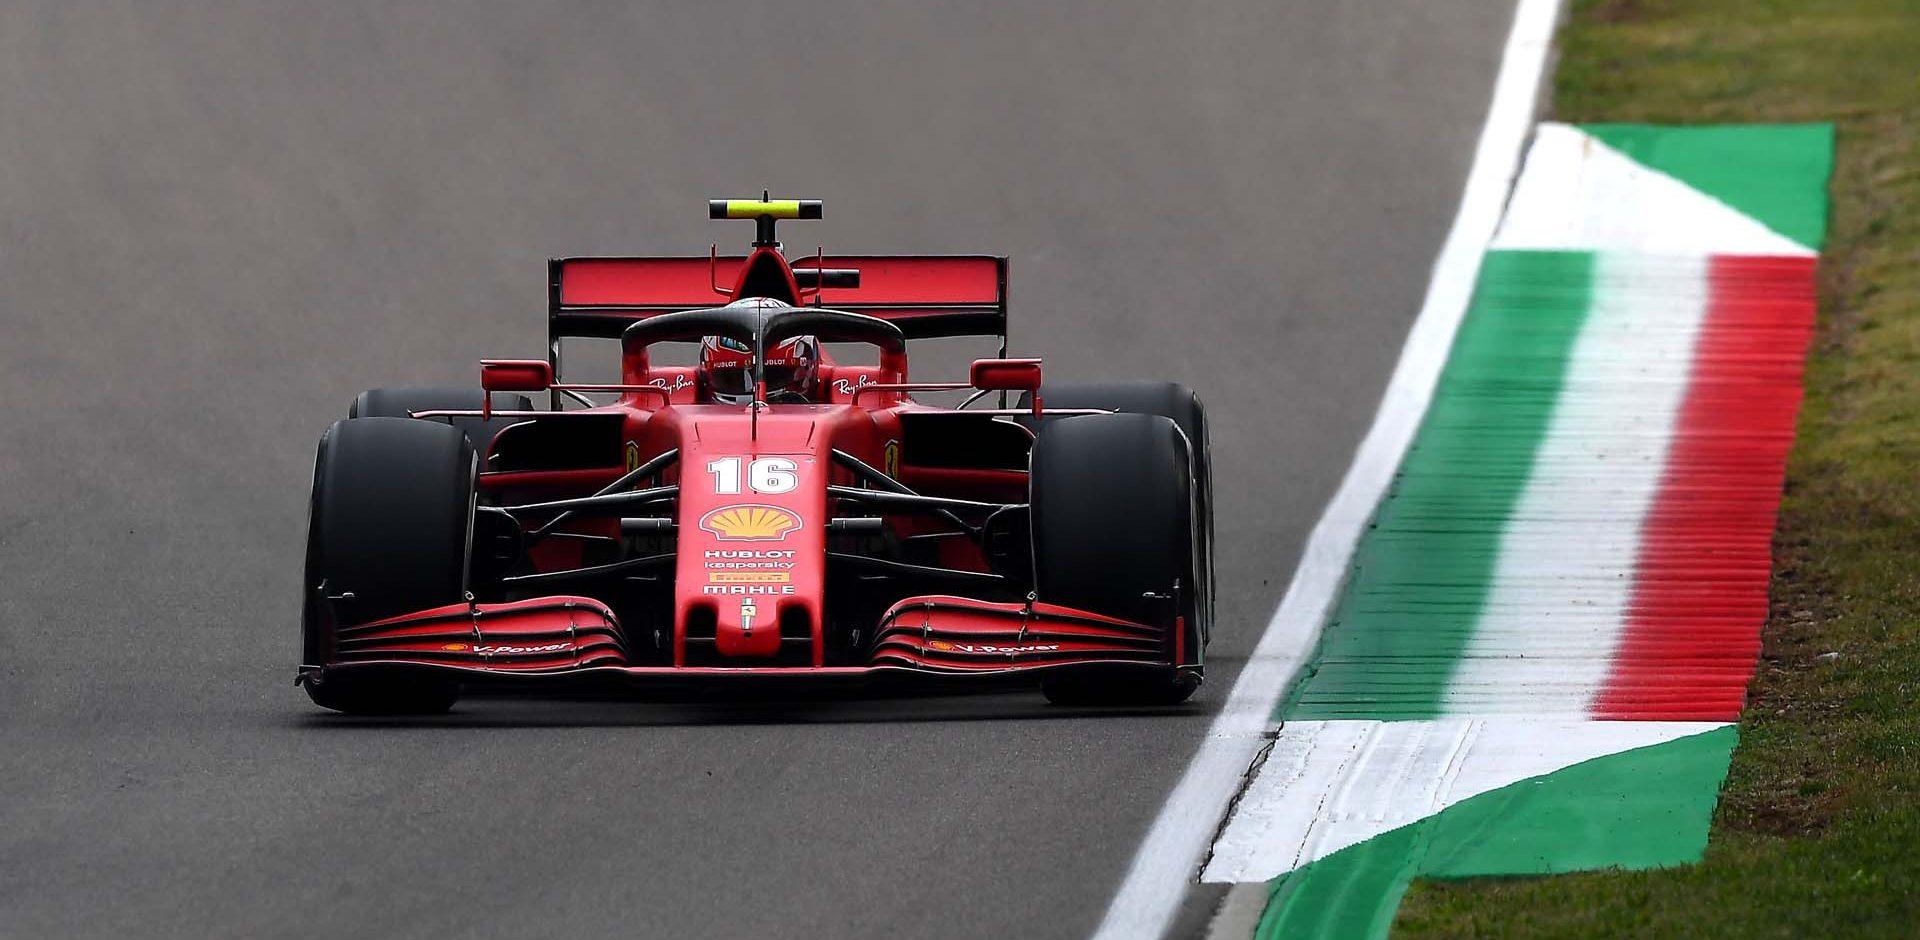 GP EMILIA ROMAGNA F1/2020 -  DOMENICA 01/11/2020   Charles Leclerc credit: @Scuderia Ferrari Press Office